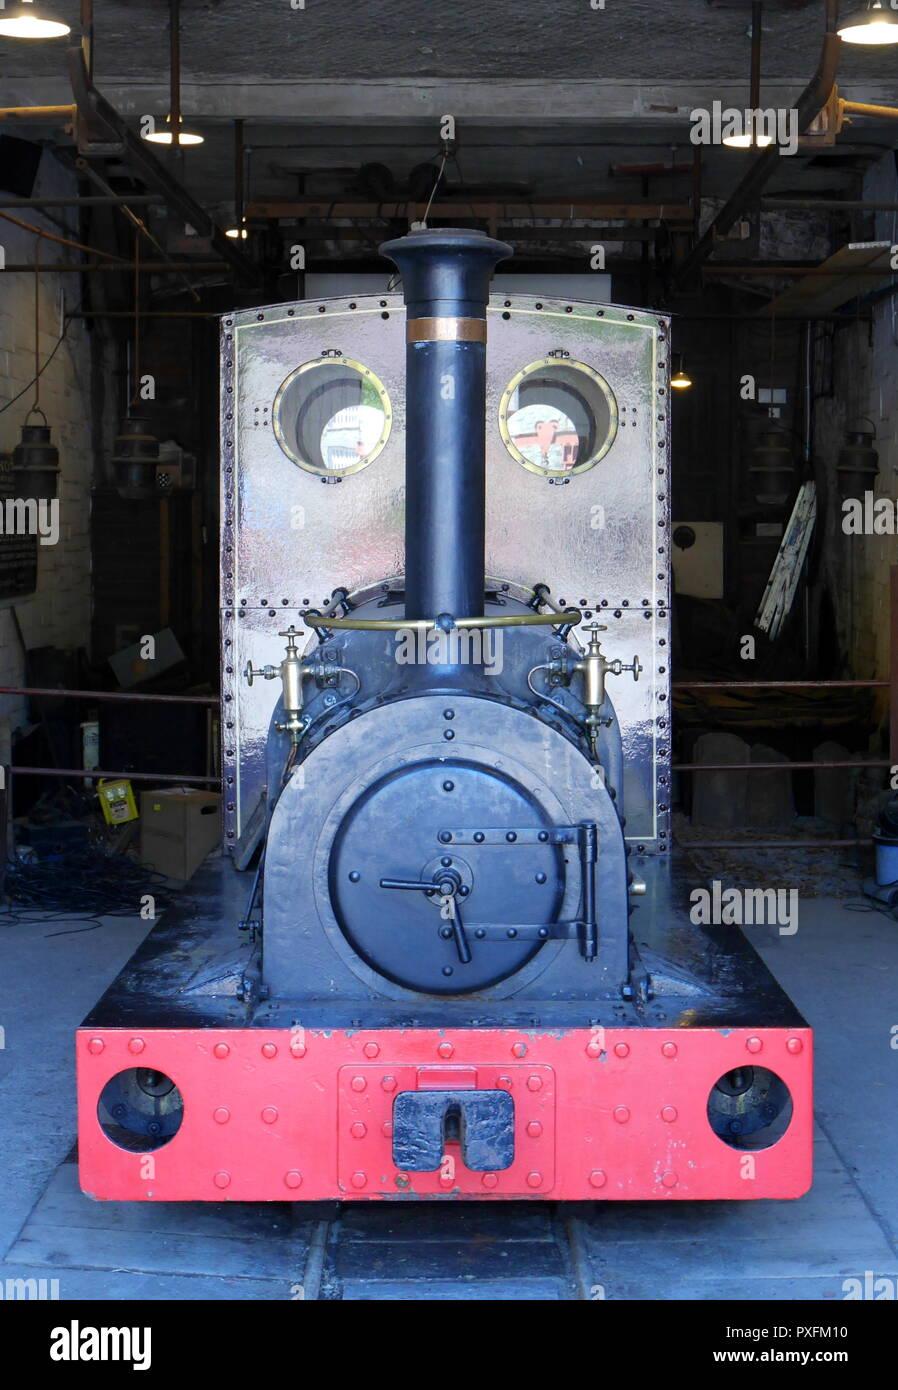 Narrow gauge locomotive, Una, at the National Slate Museum, Llanberis, Snowdonia, Gwynedd, North Wales, United Kingdom - Stock Image